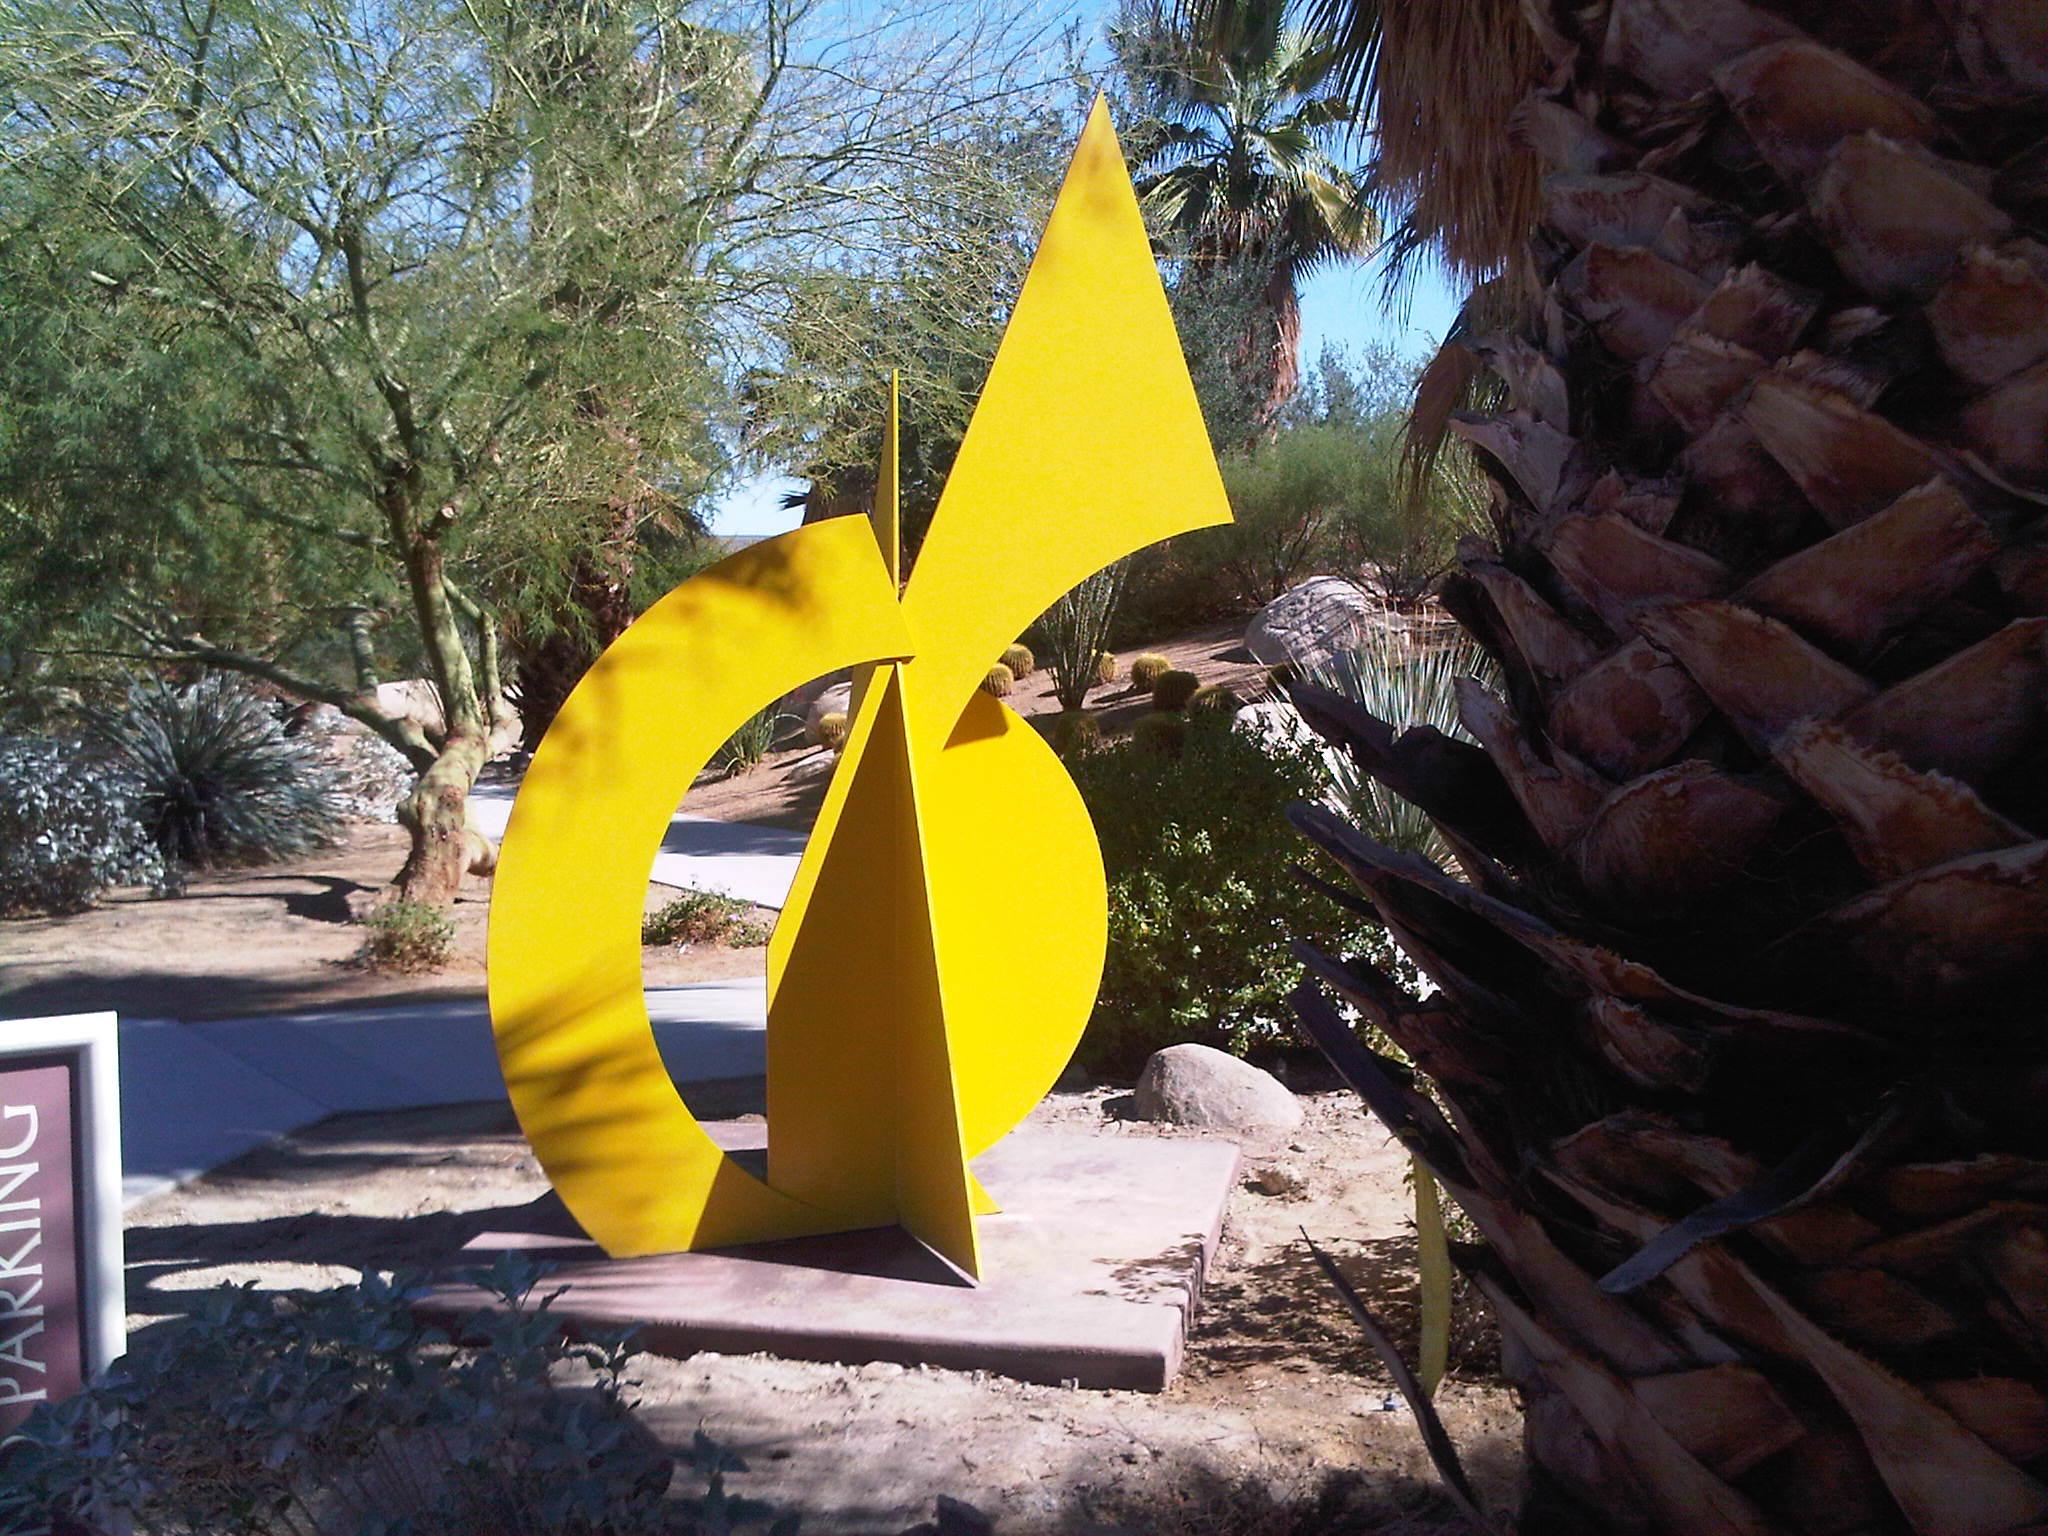 at Palm Springs Desert Museum